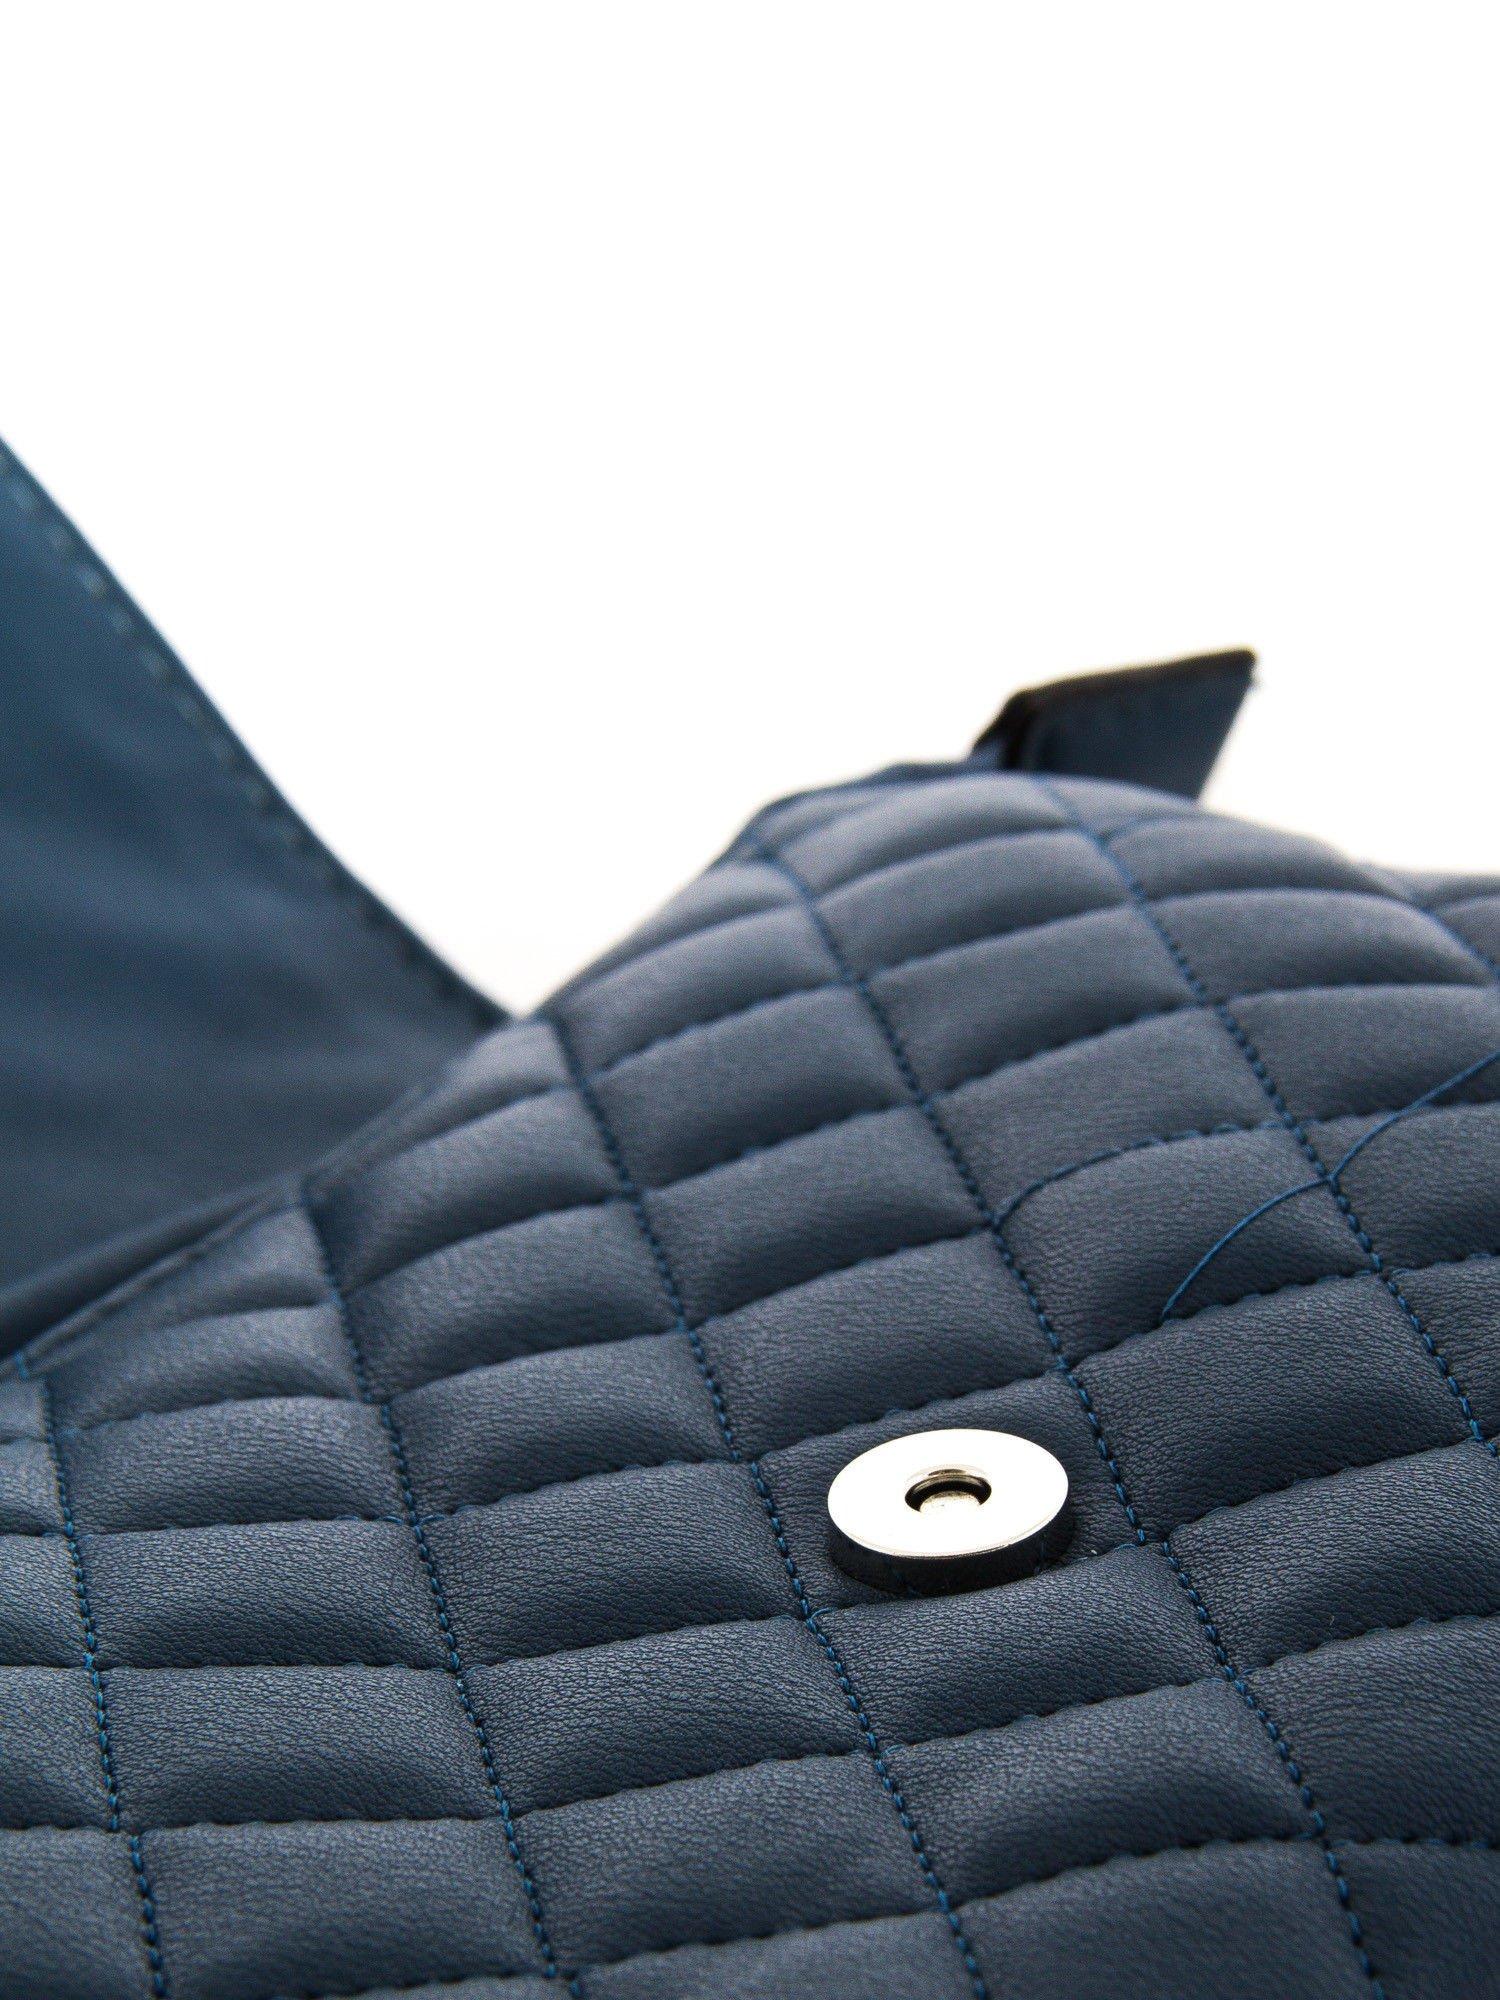 Ciemnoniebieska pikowana torba typu listonoszka                                  zdj.                                  4